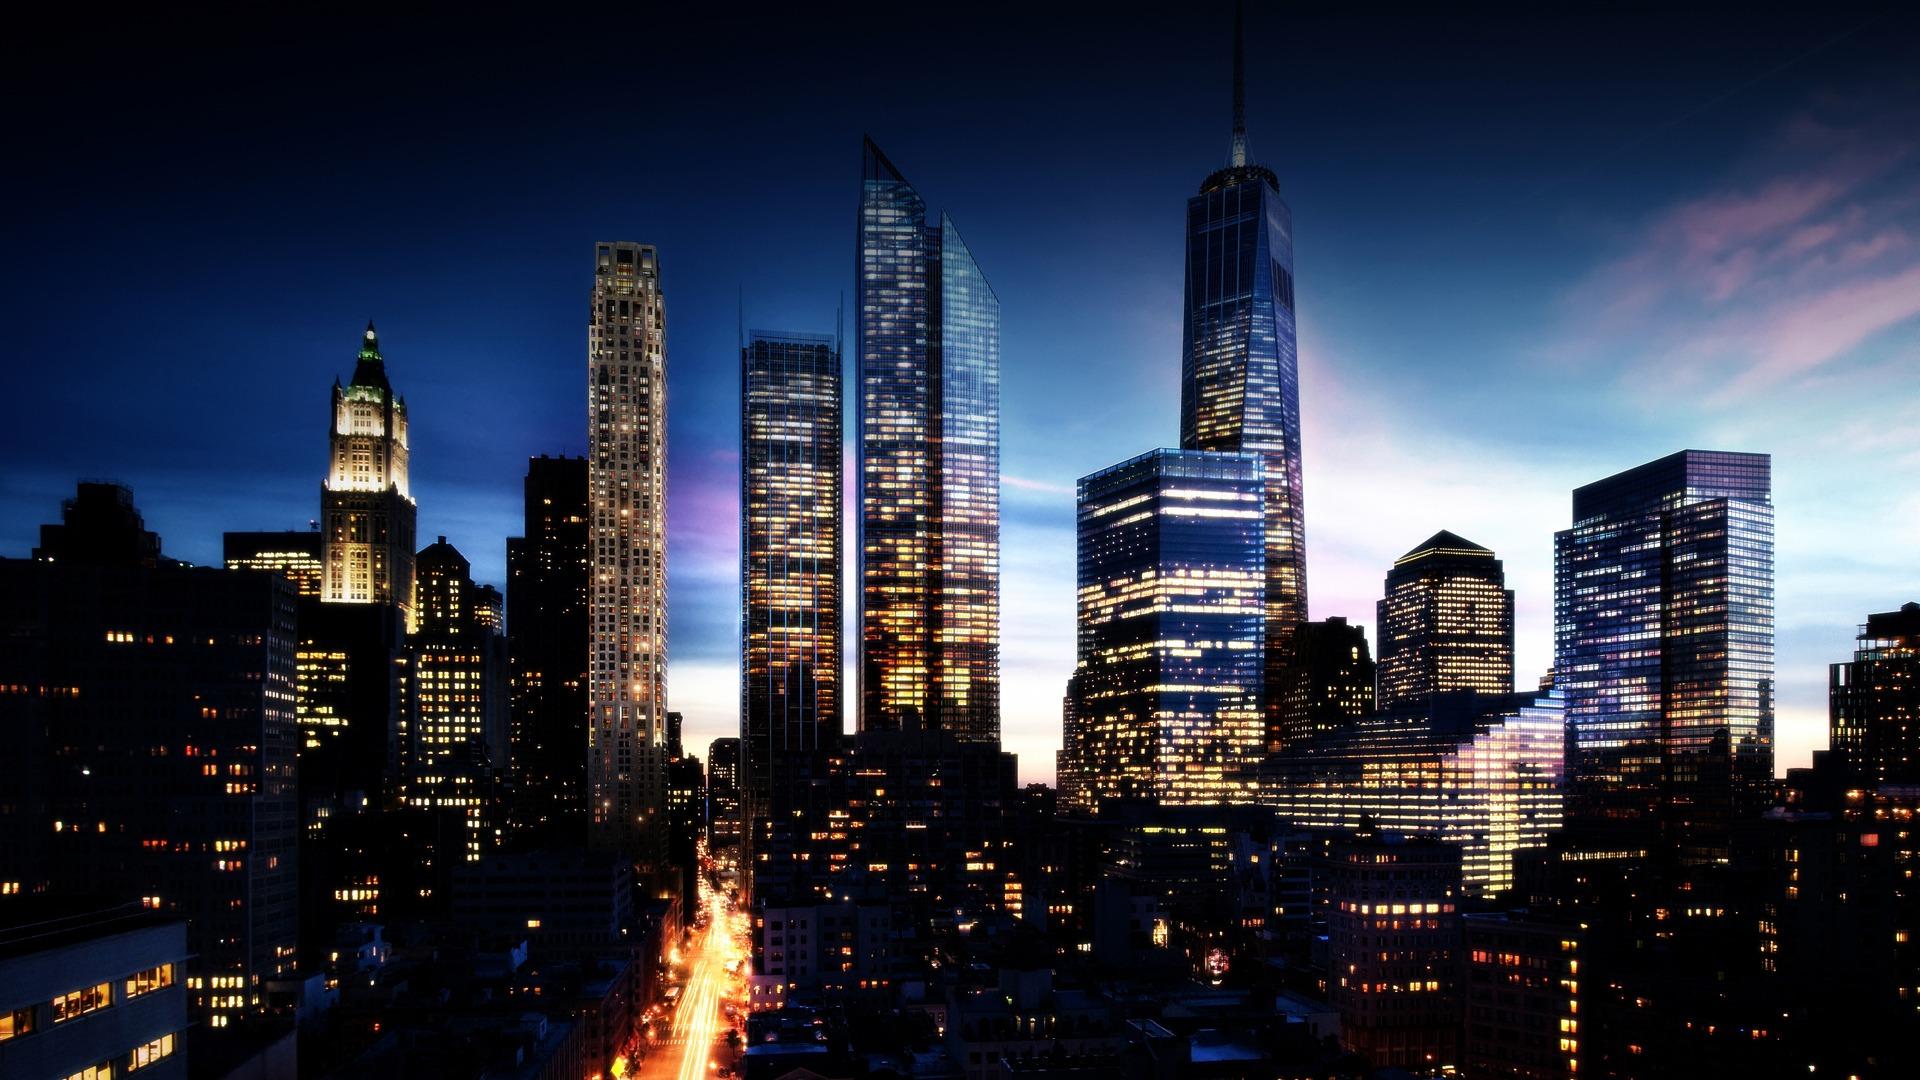 City Skyline Wallpaper 29